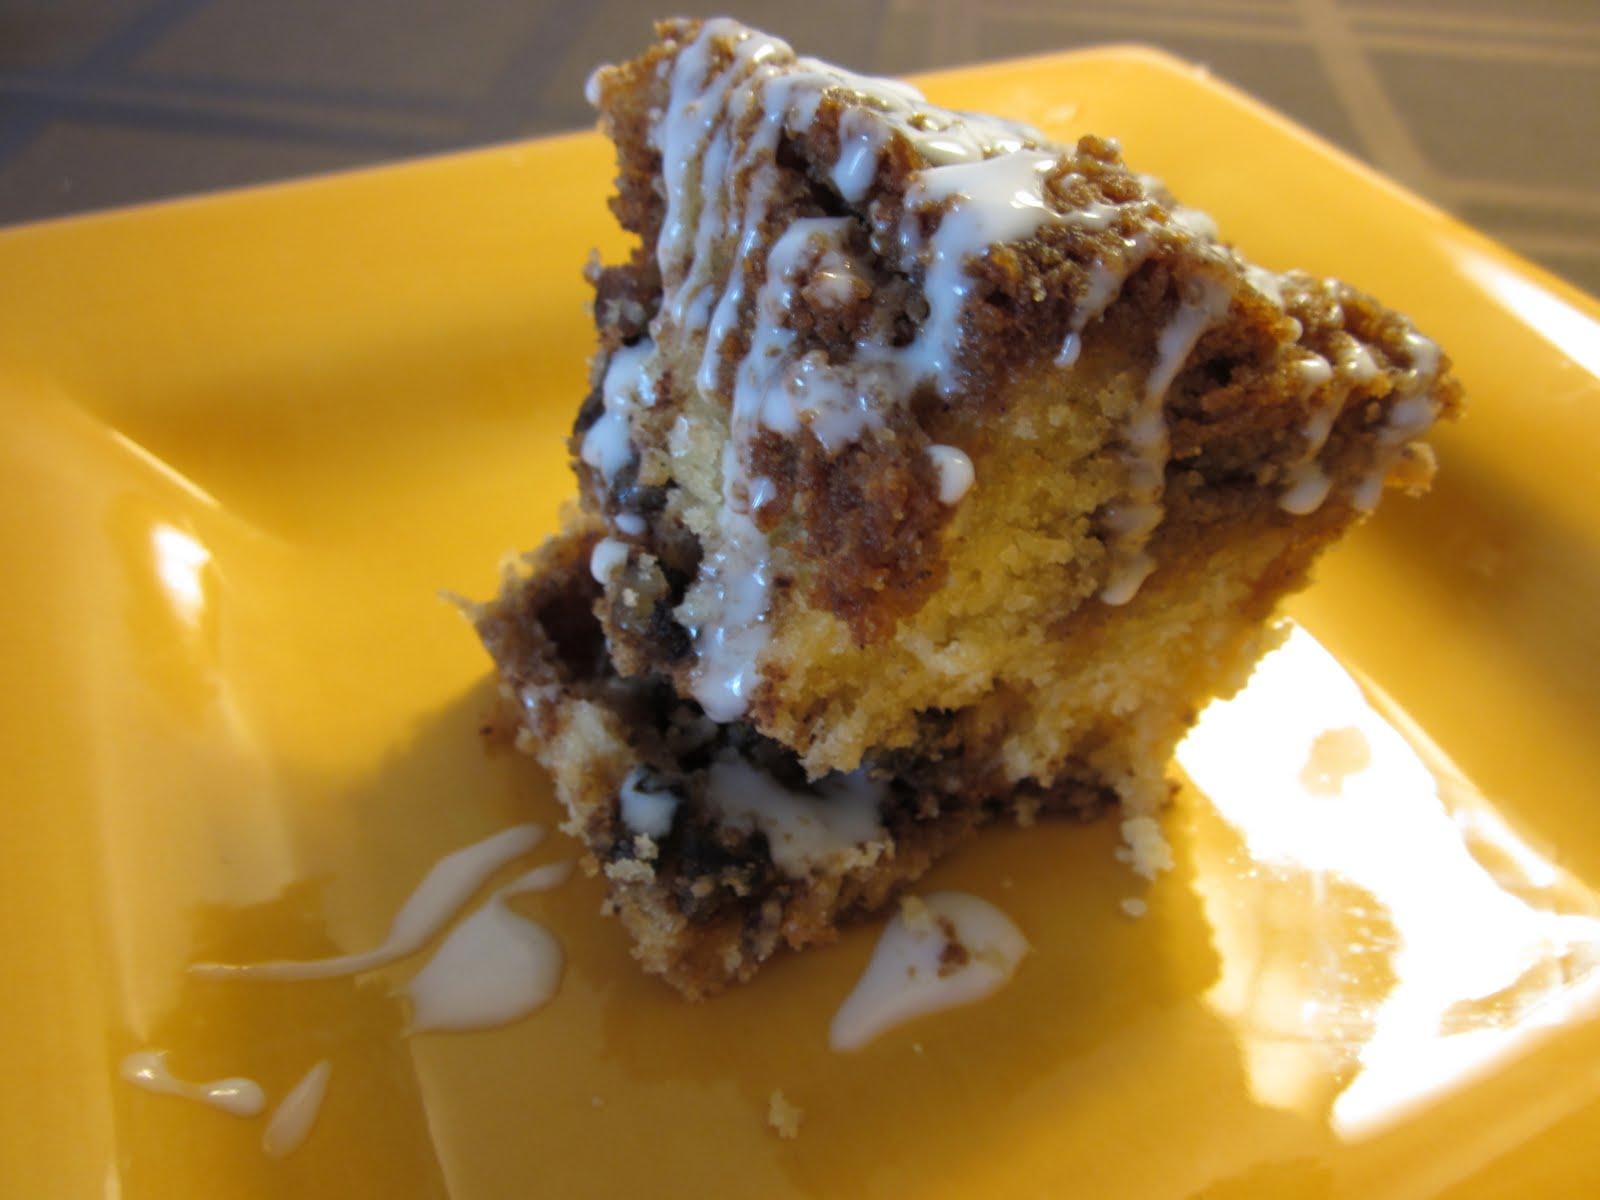 Make Gluten Free Cinnamon Coffee Cake From Scratch